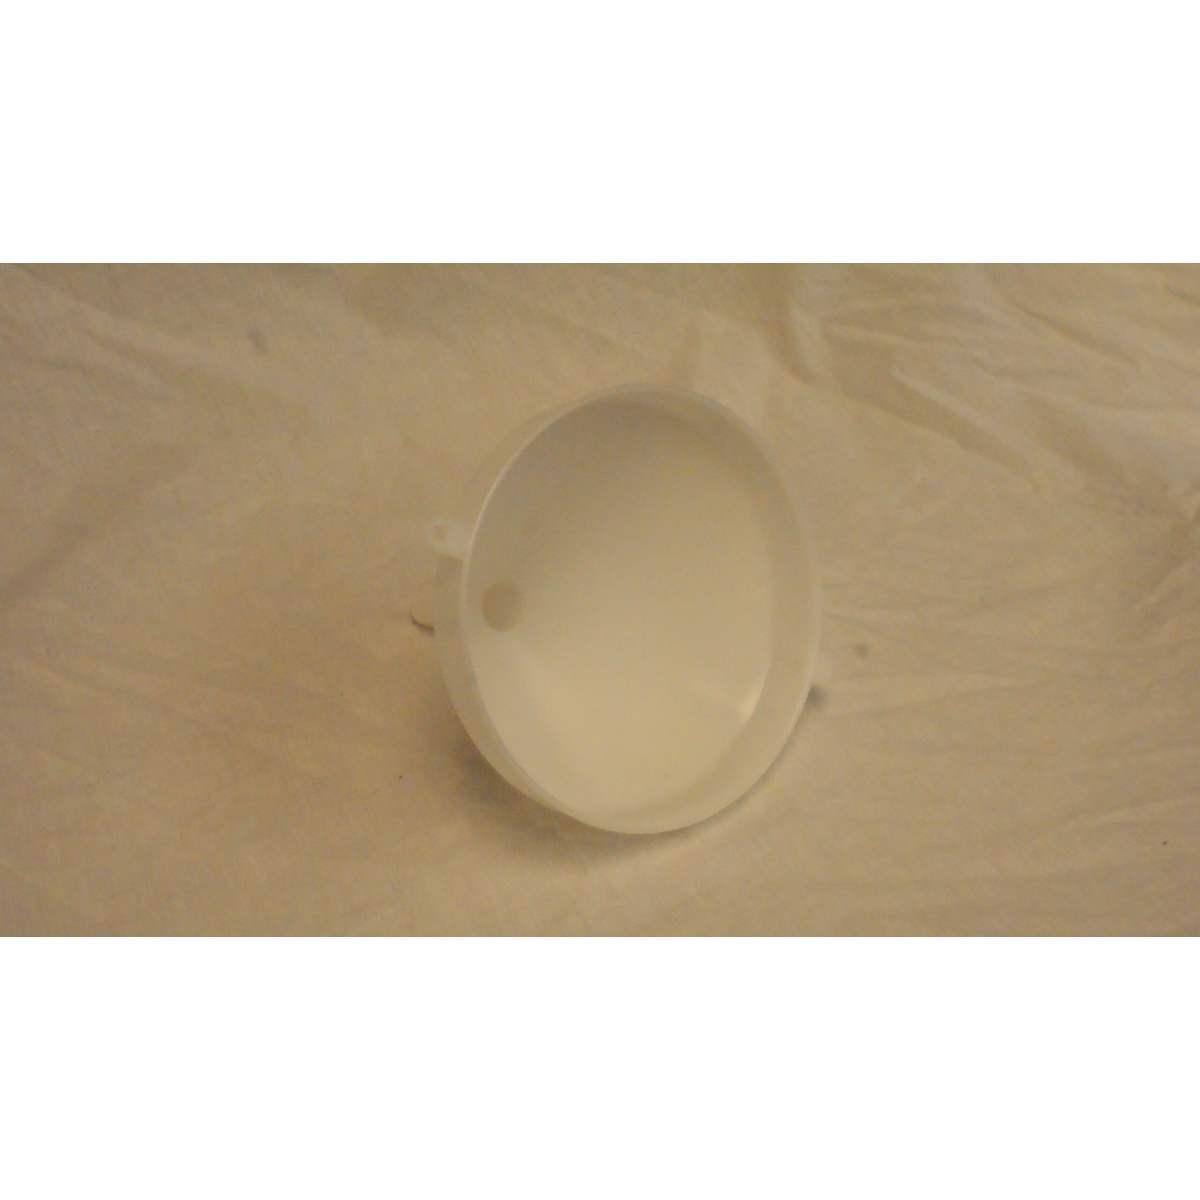 15cm White Plastic Funnel